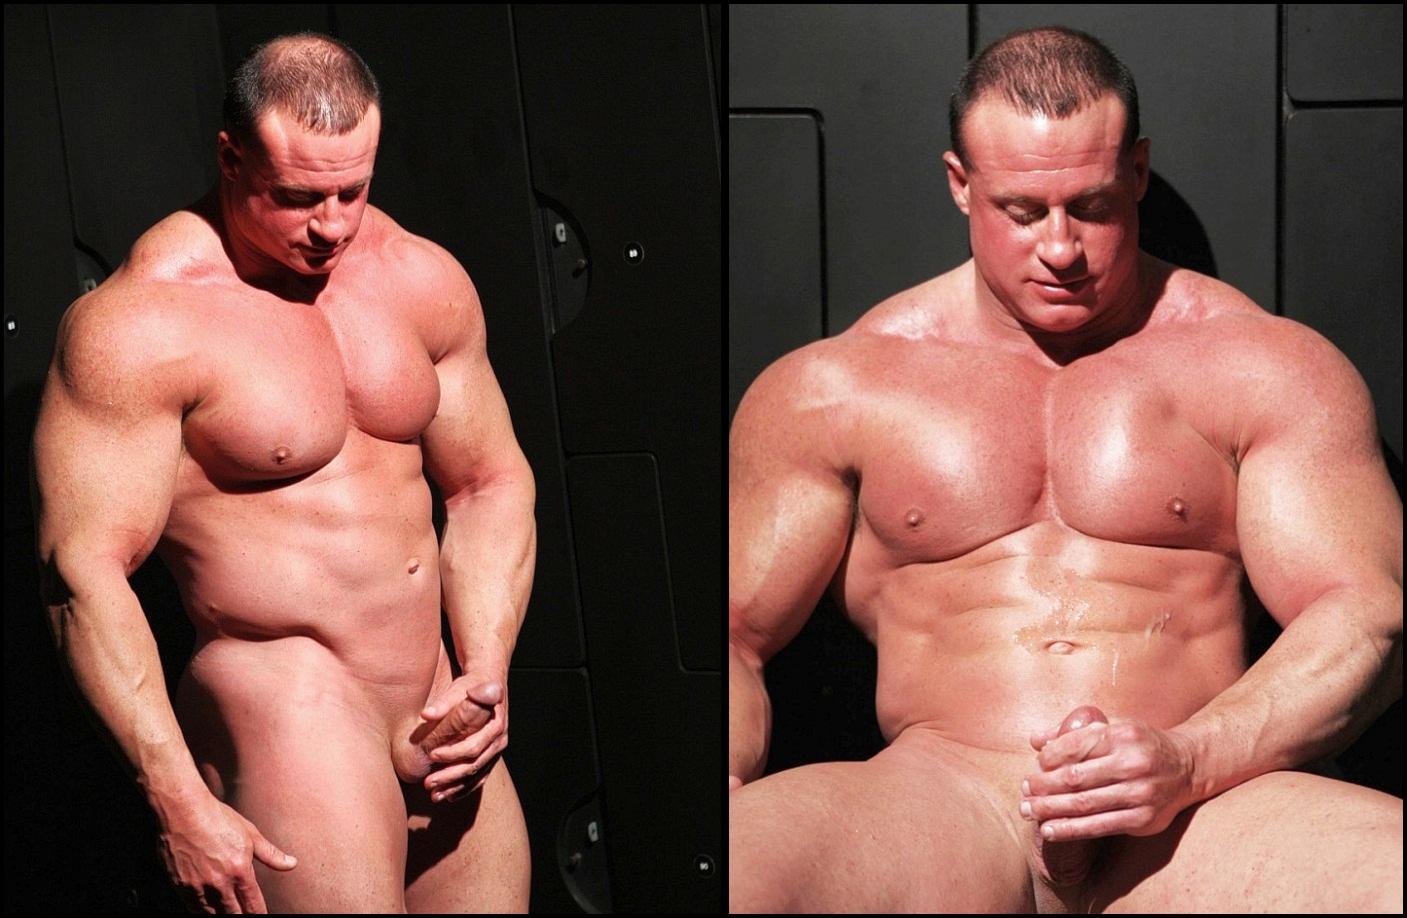 Сильвестр сталлоне видео порно